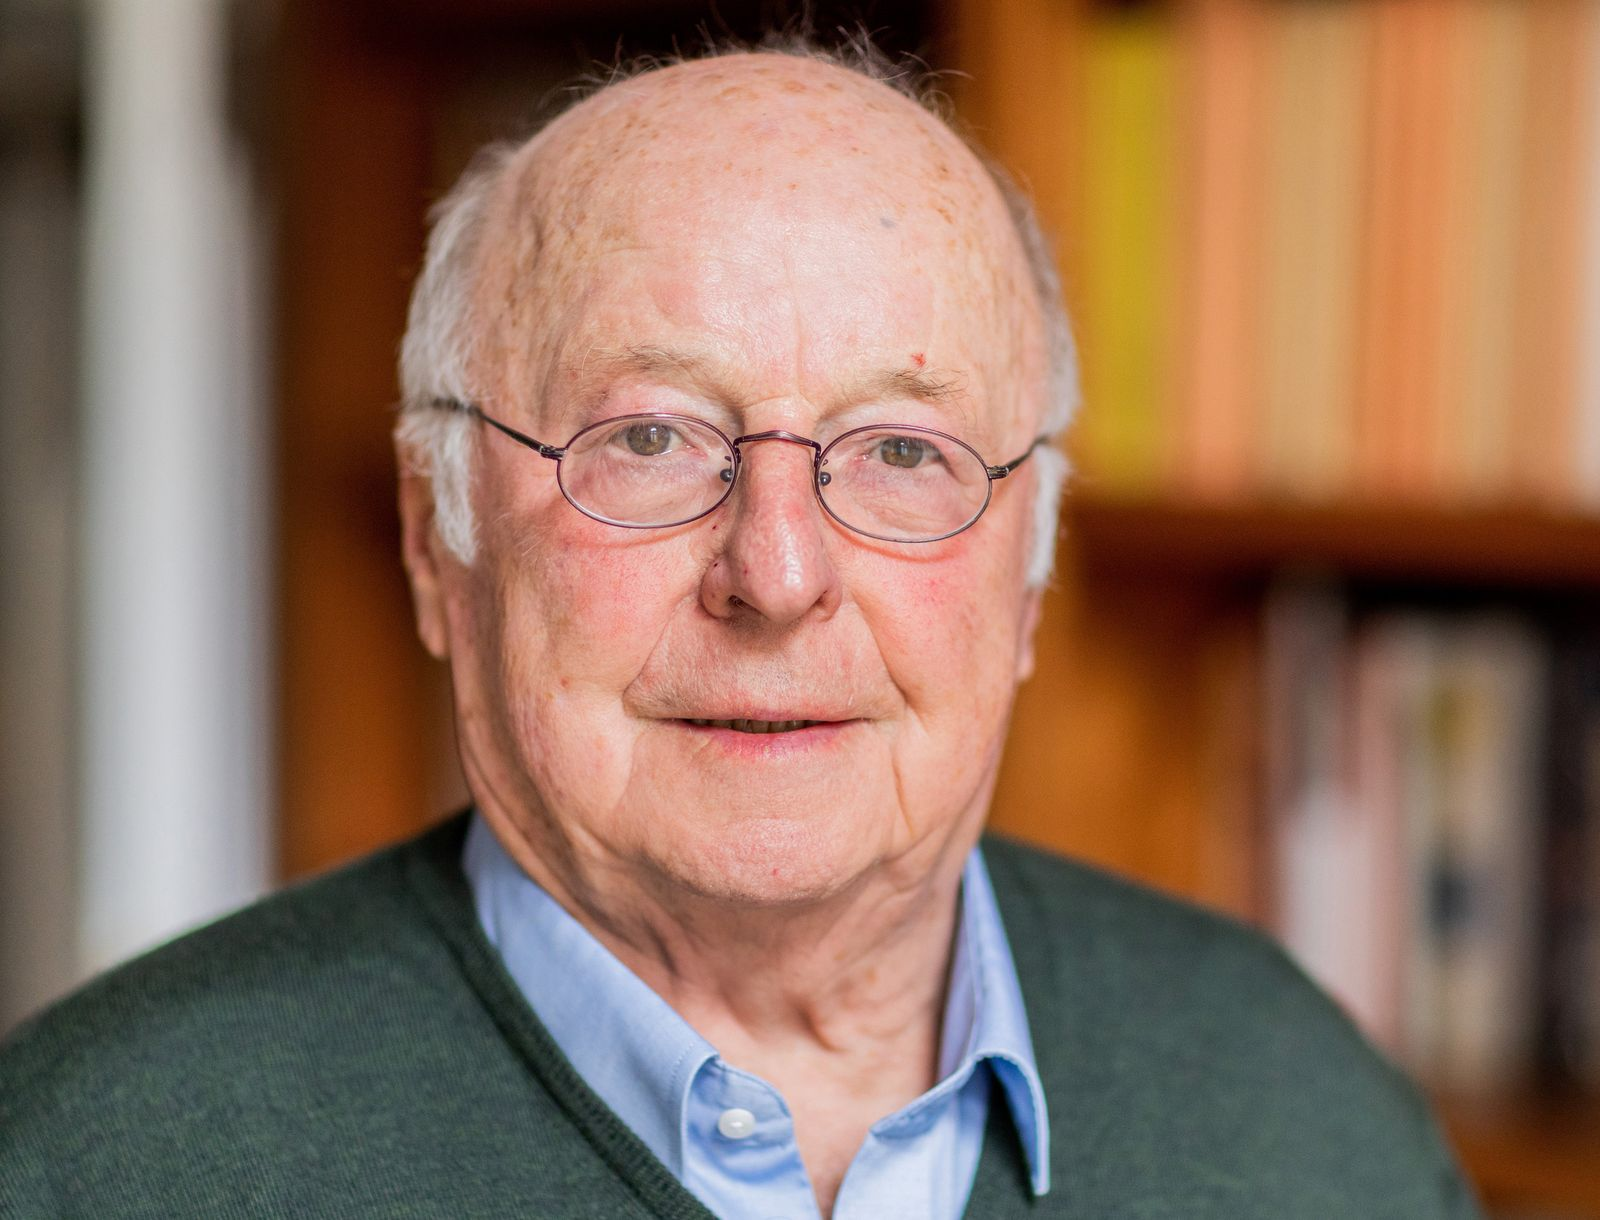 Früherer Arbeitsminister Norbert Blüm gestorben